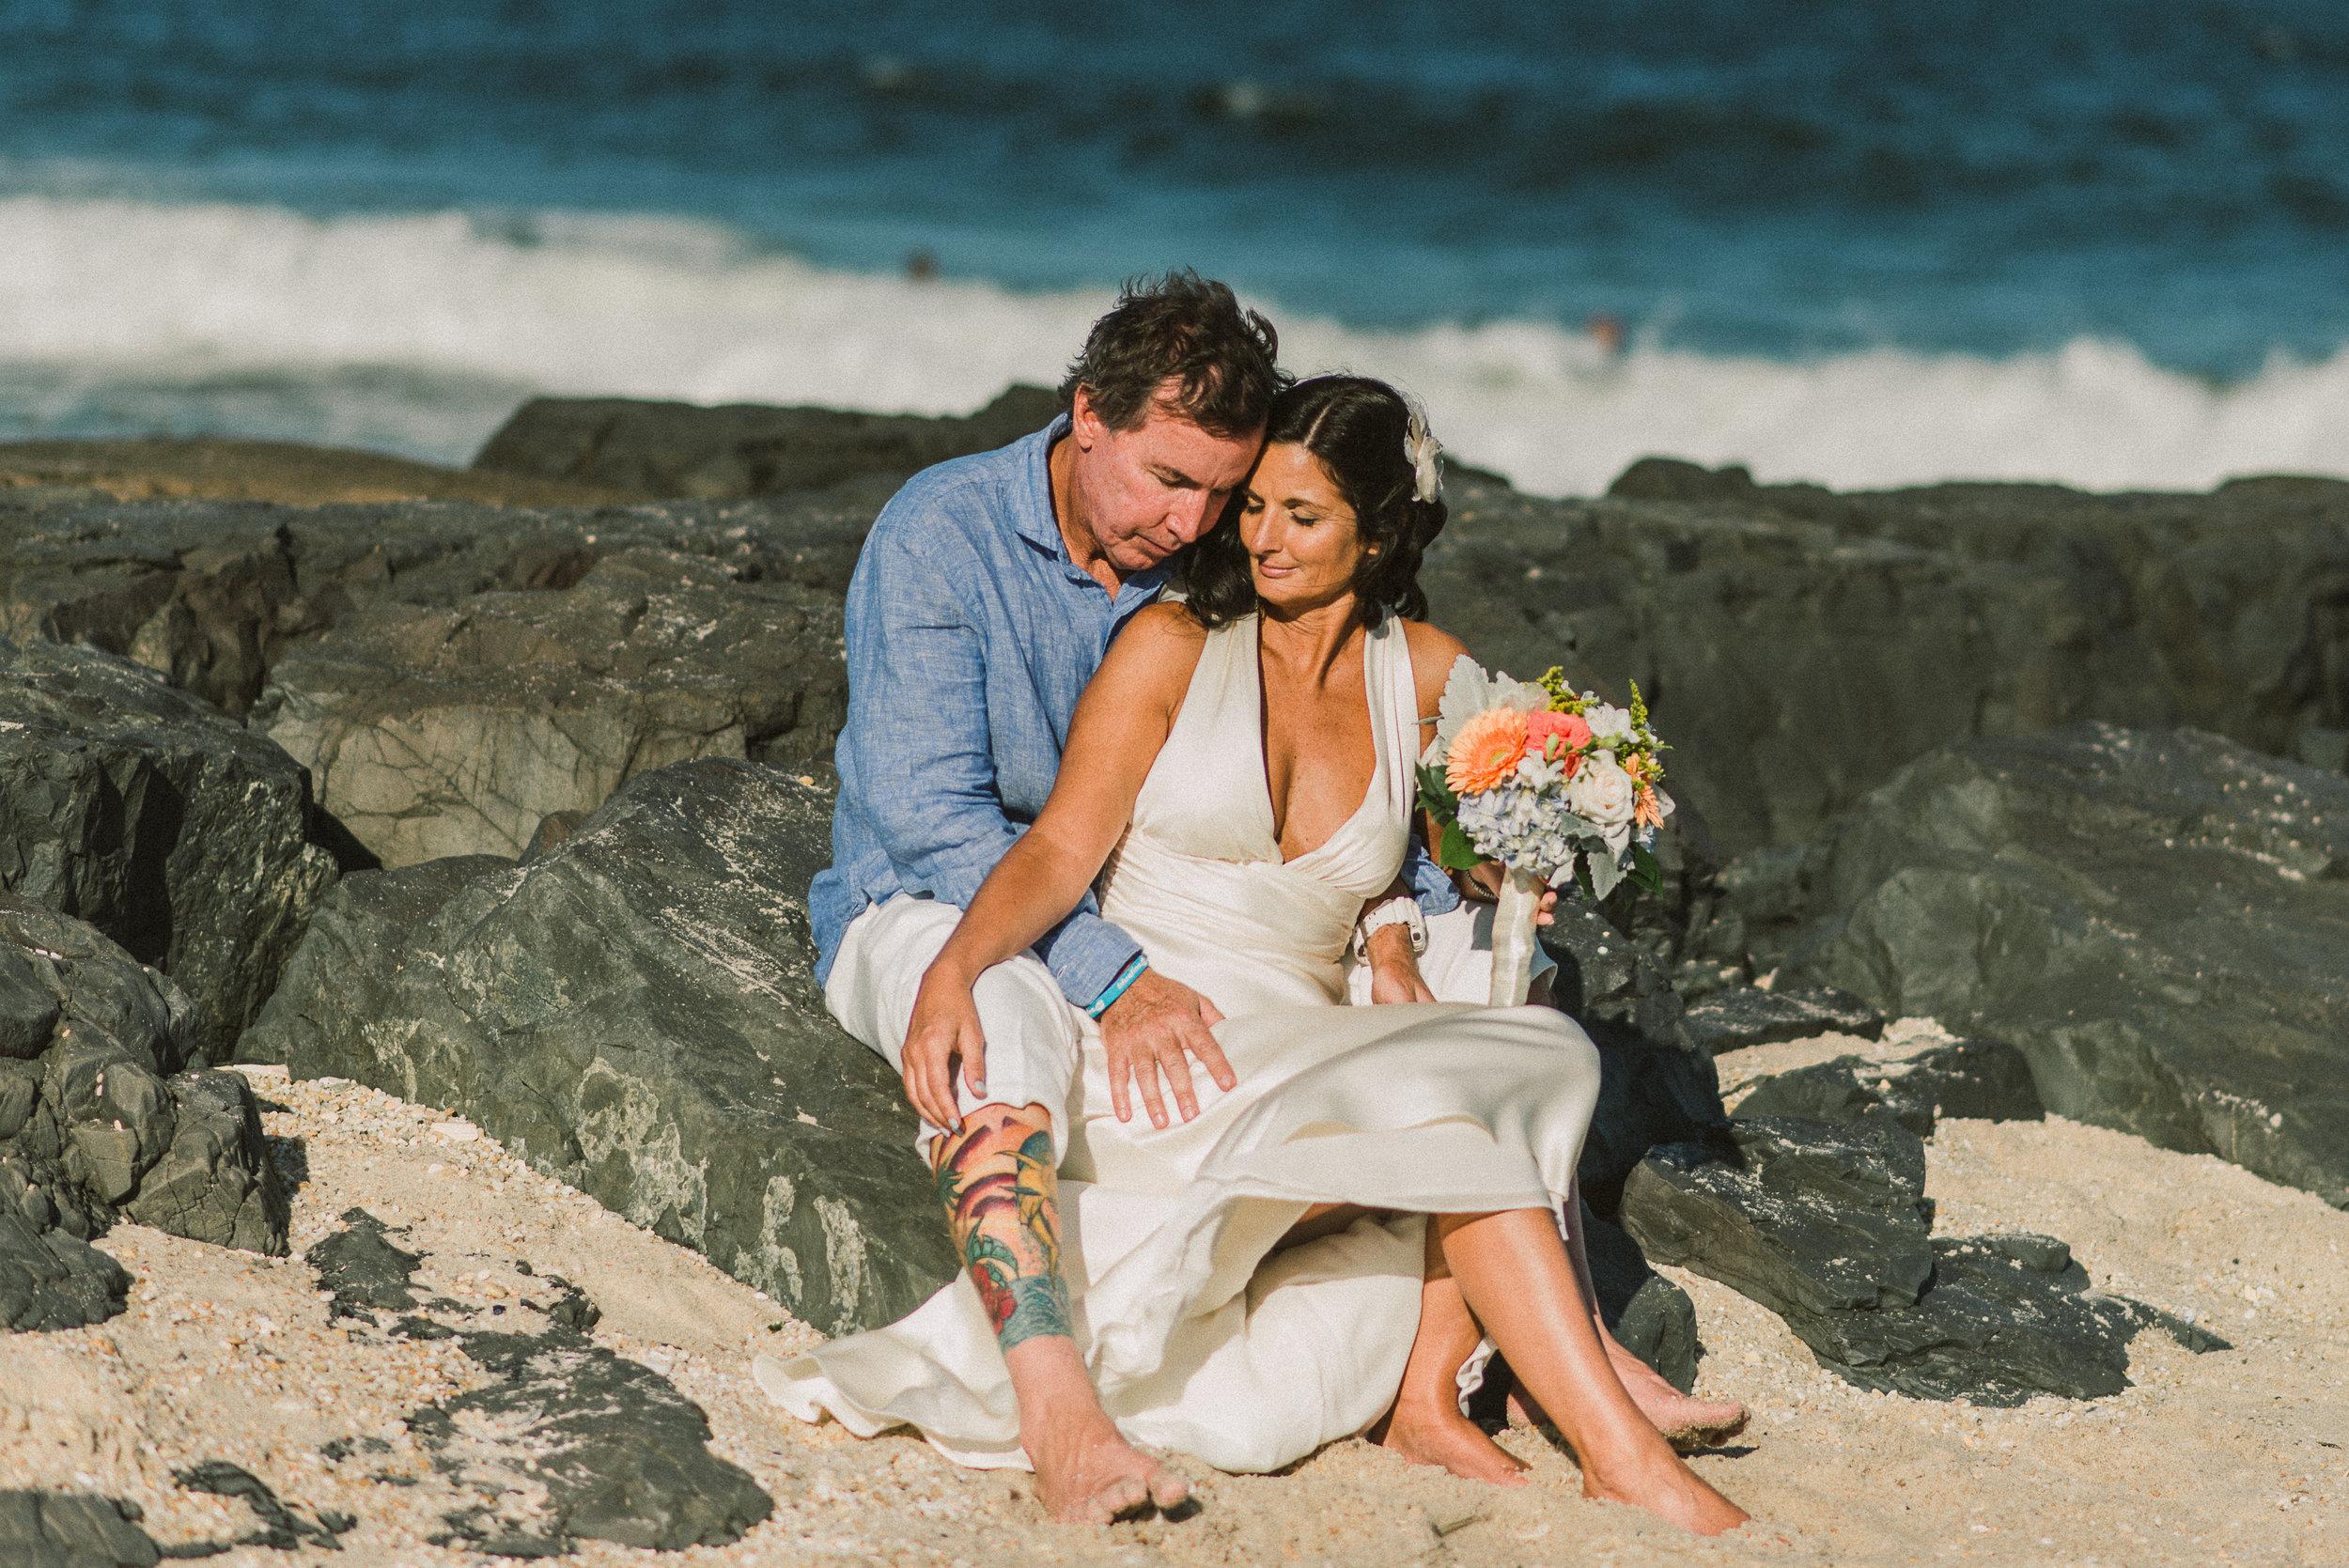 John-Michelle-Wedding-Marla-Rain-Photography-225.jpg